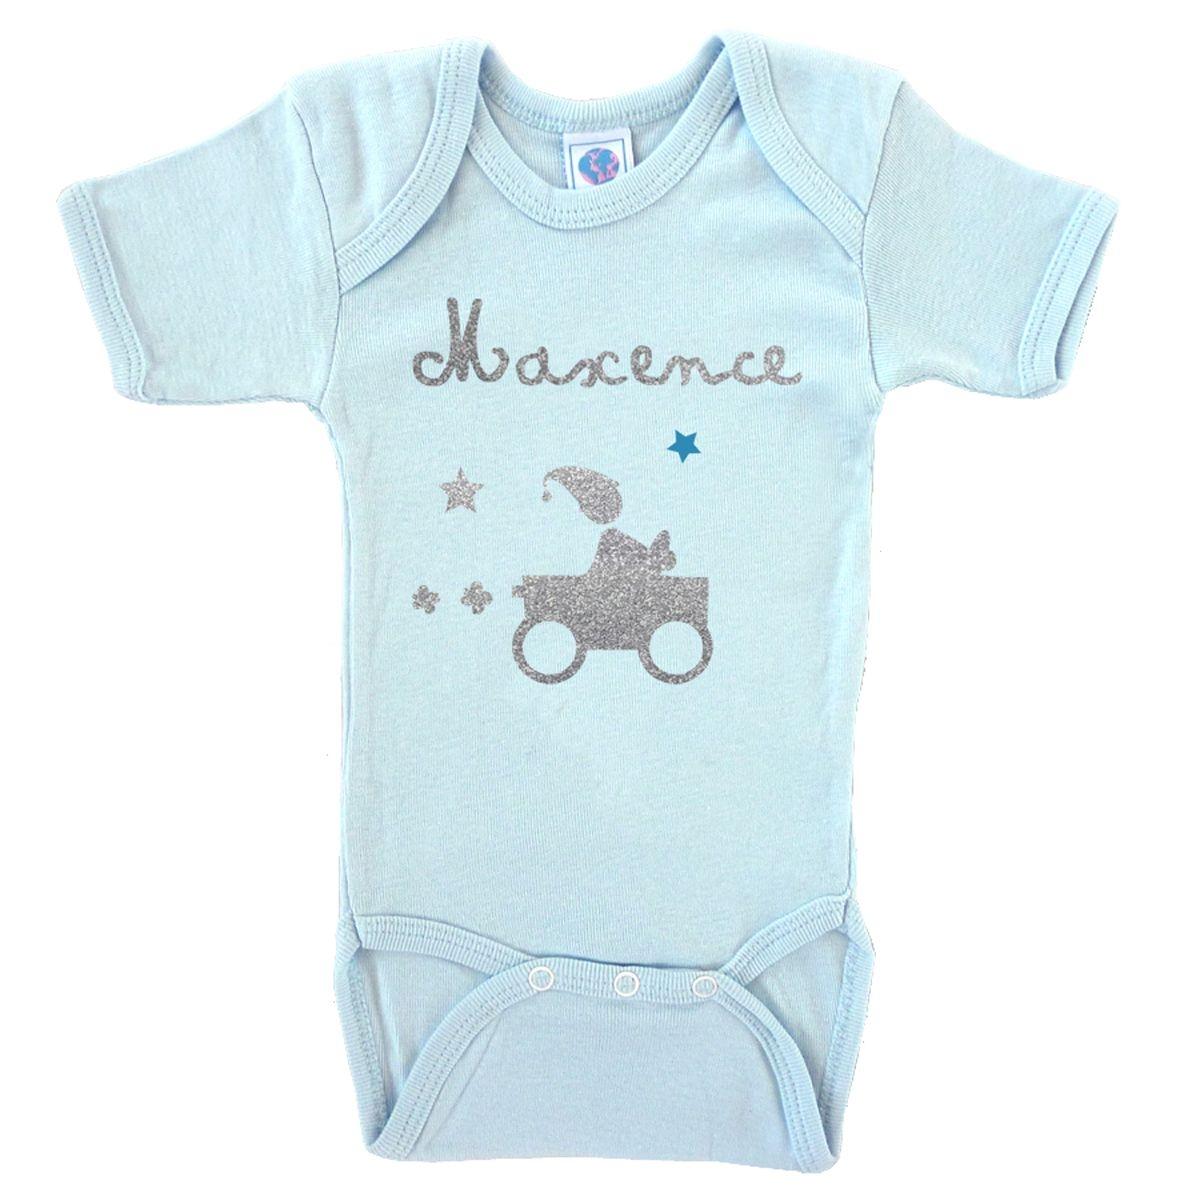 Body bébé prénom en coton manches courtes bleu